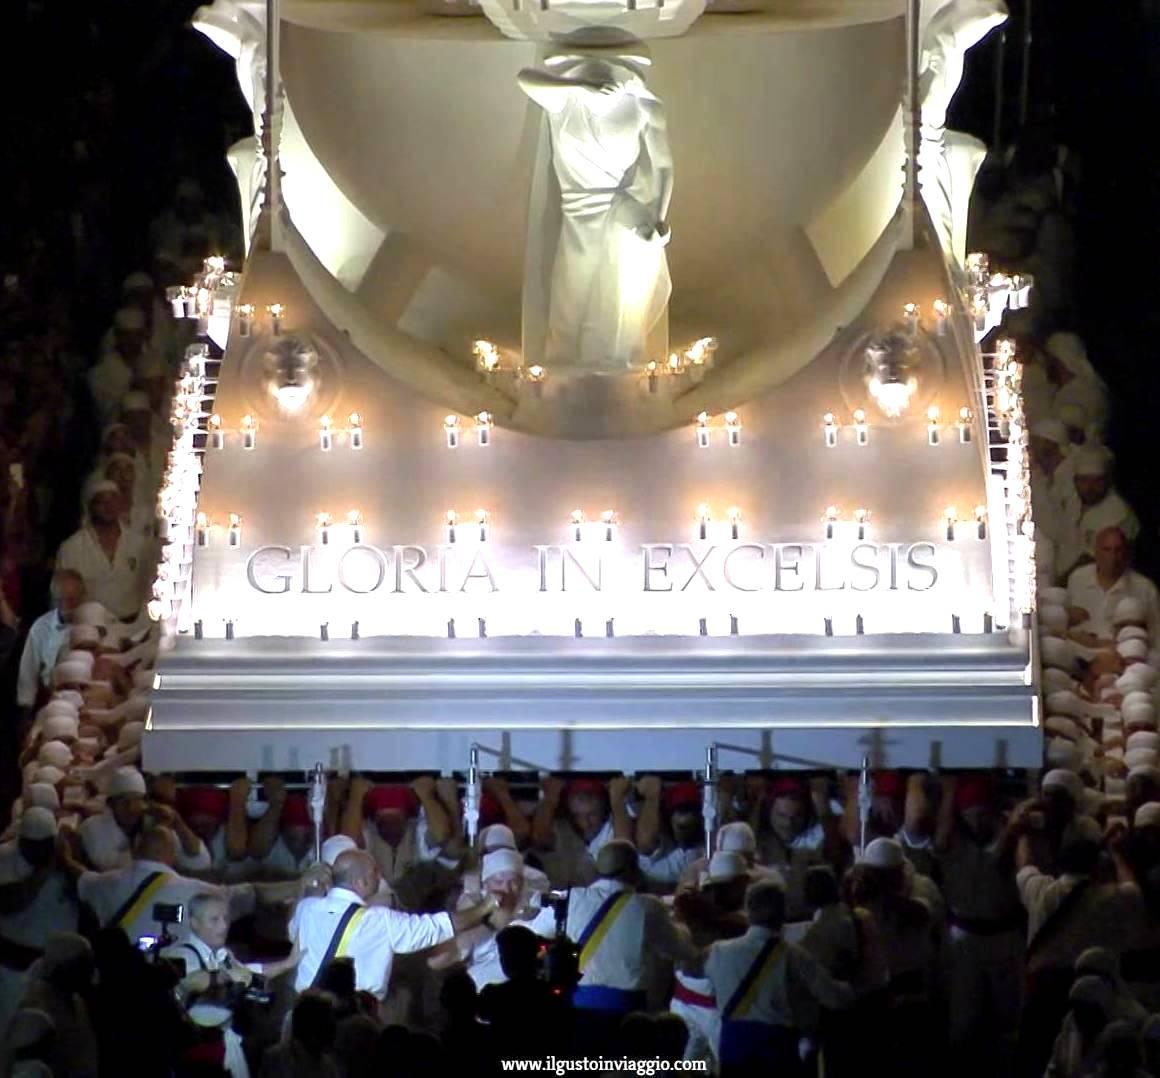 macchina santa rosa, viterbo, trasporto della macchina di santa rosa di viterbo, trasporto 3 settembre